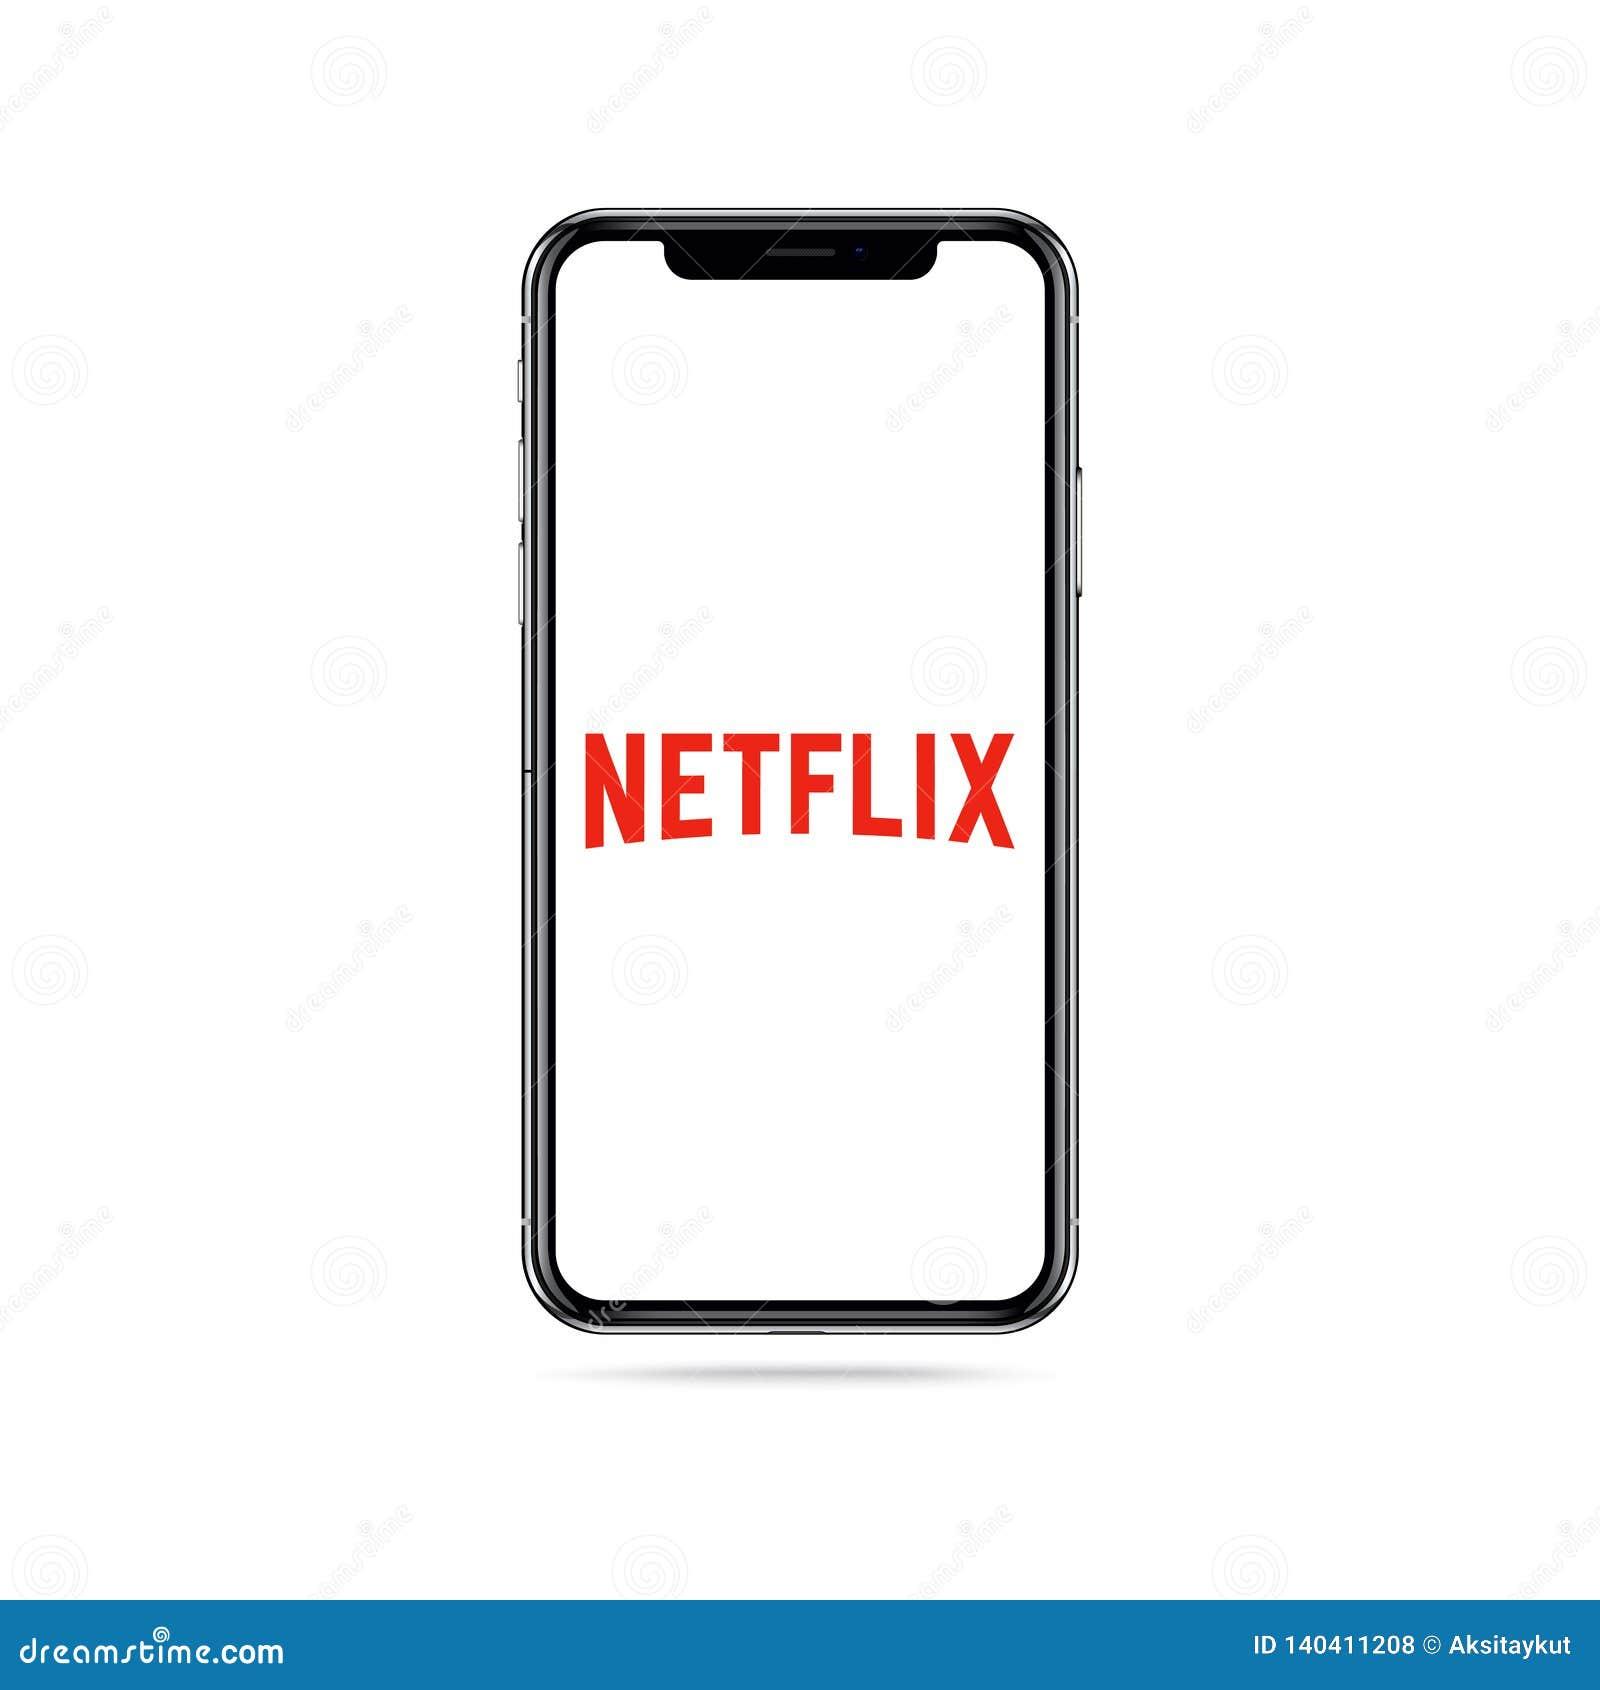 Netflix app logo ikona na iphone ekranie